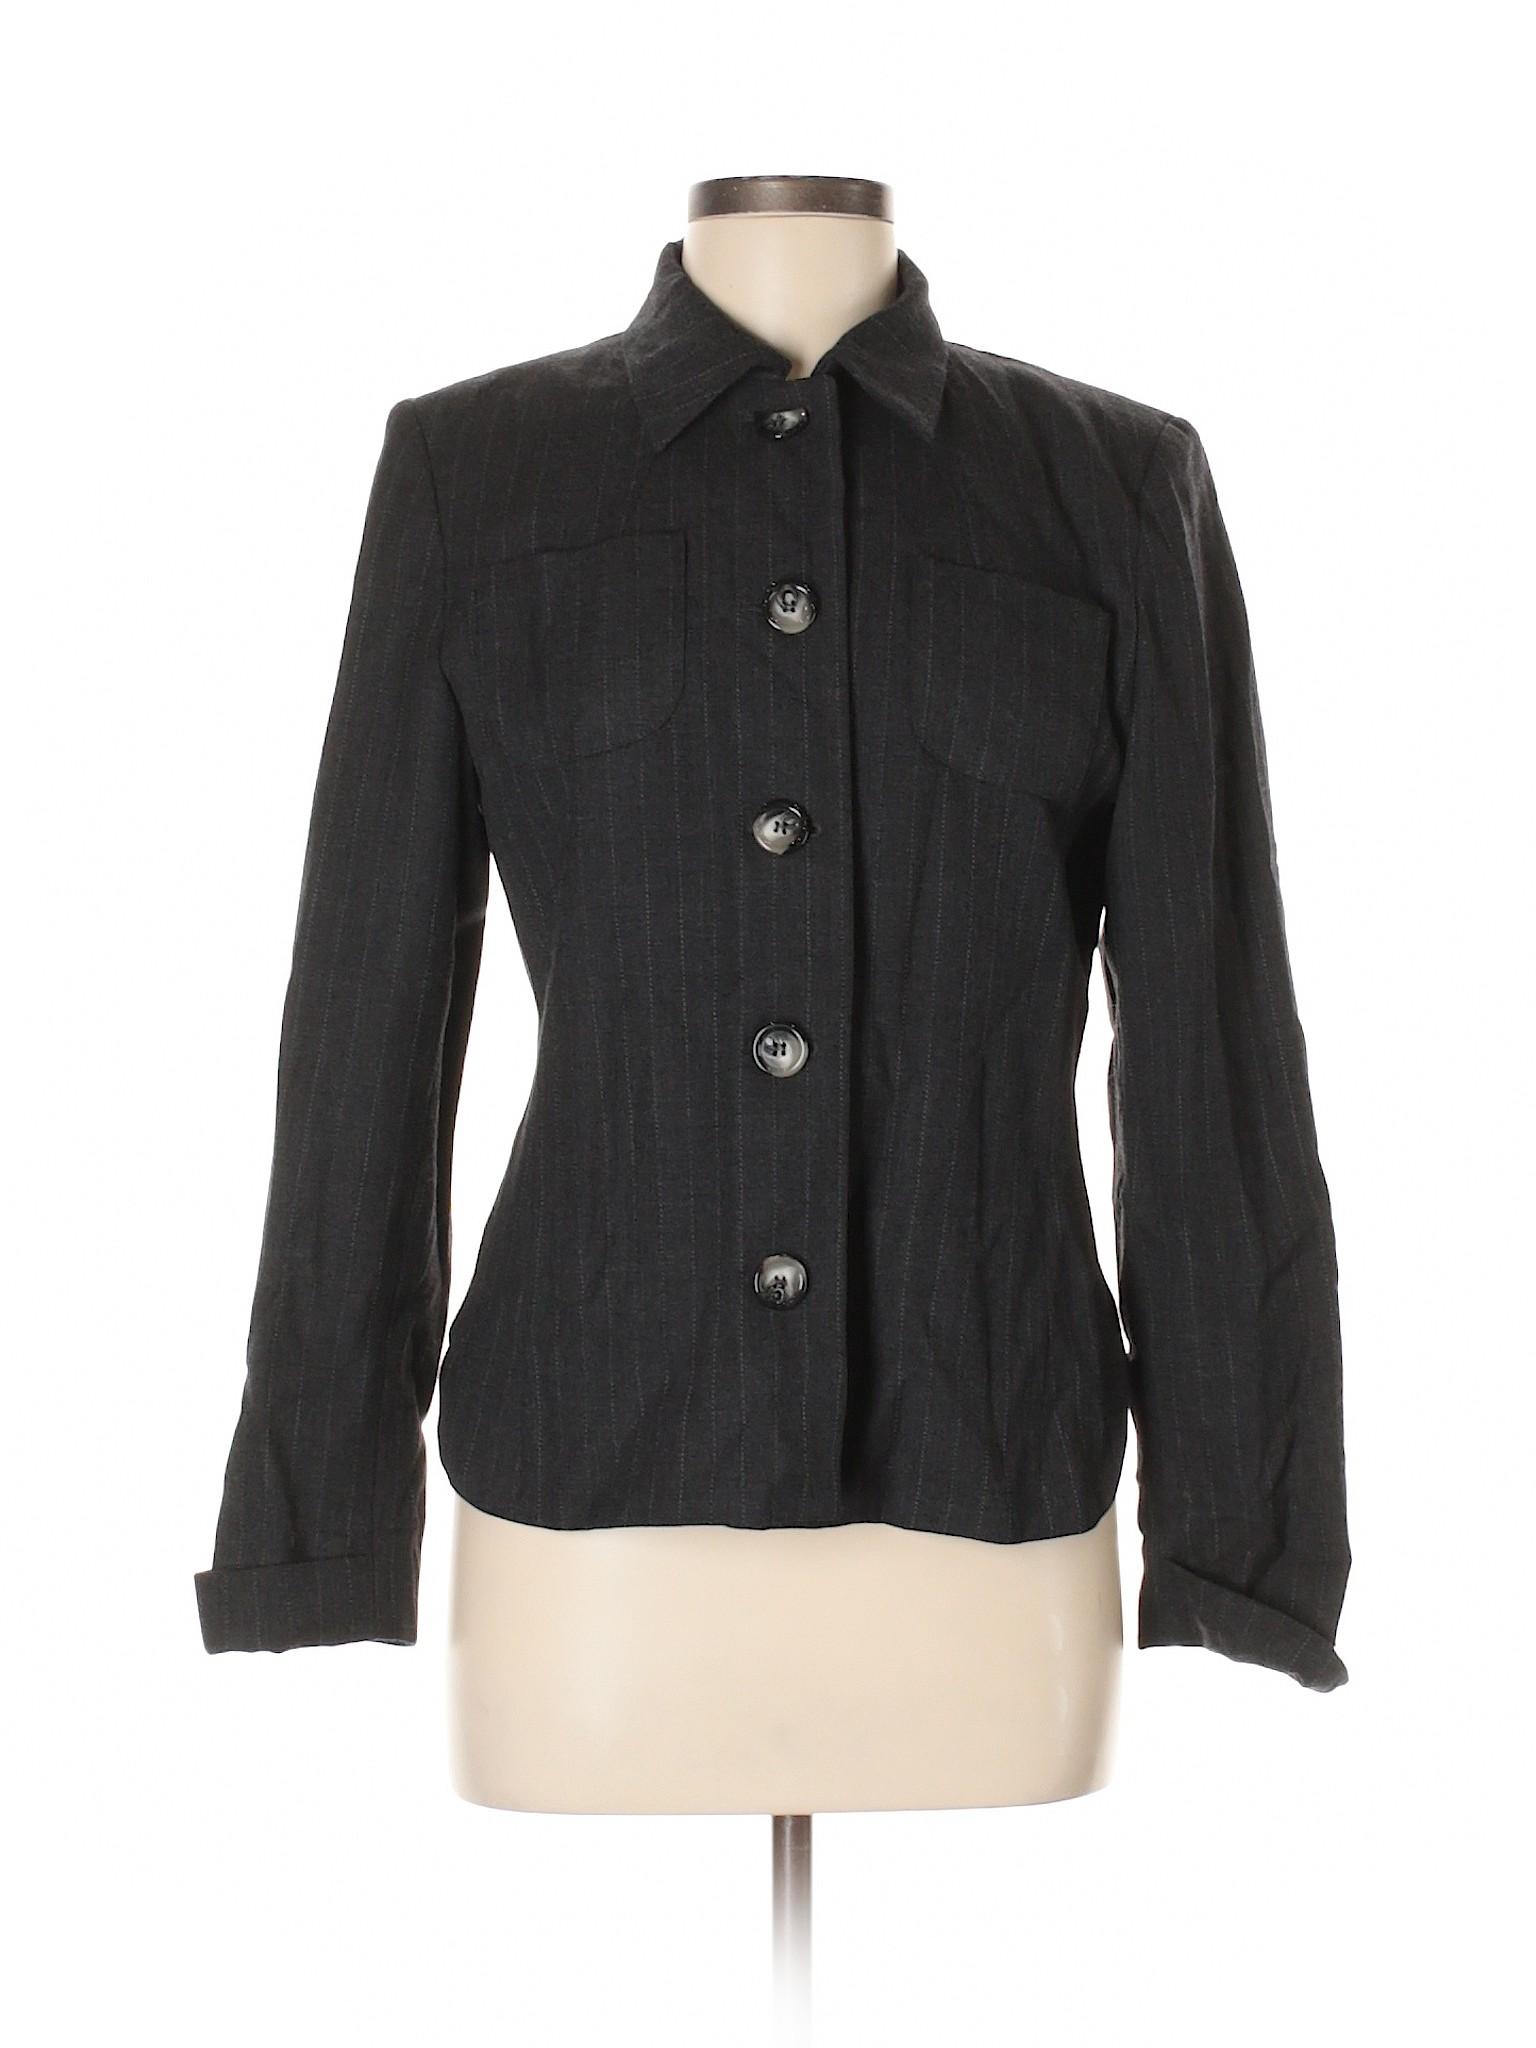 Holtzman Harve Benard Benard Blazer Wool by Boutique leisure UXw7fvqp